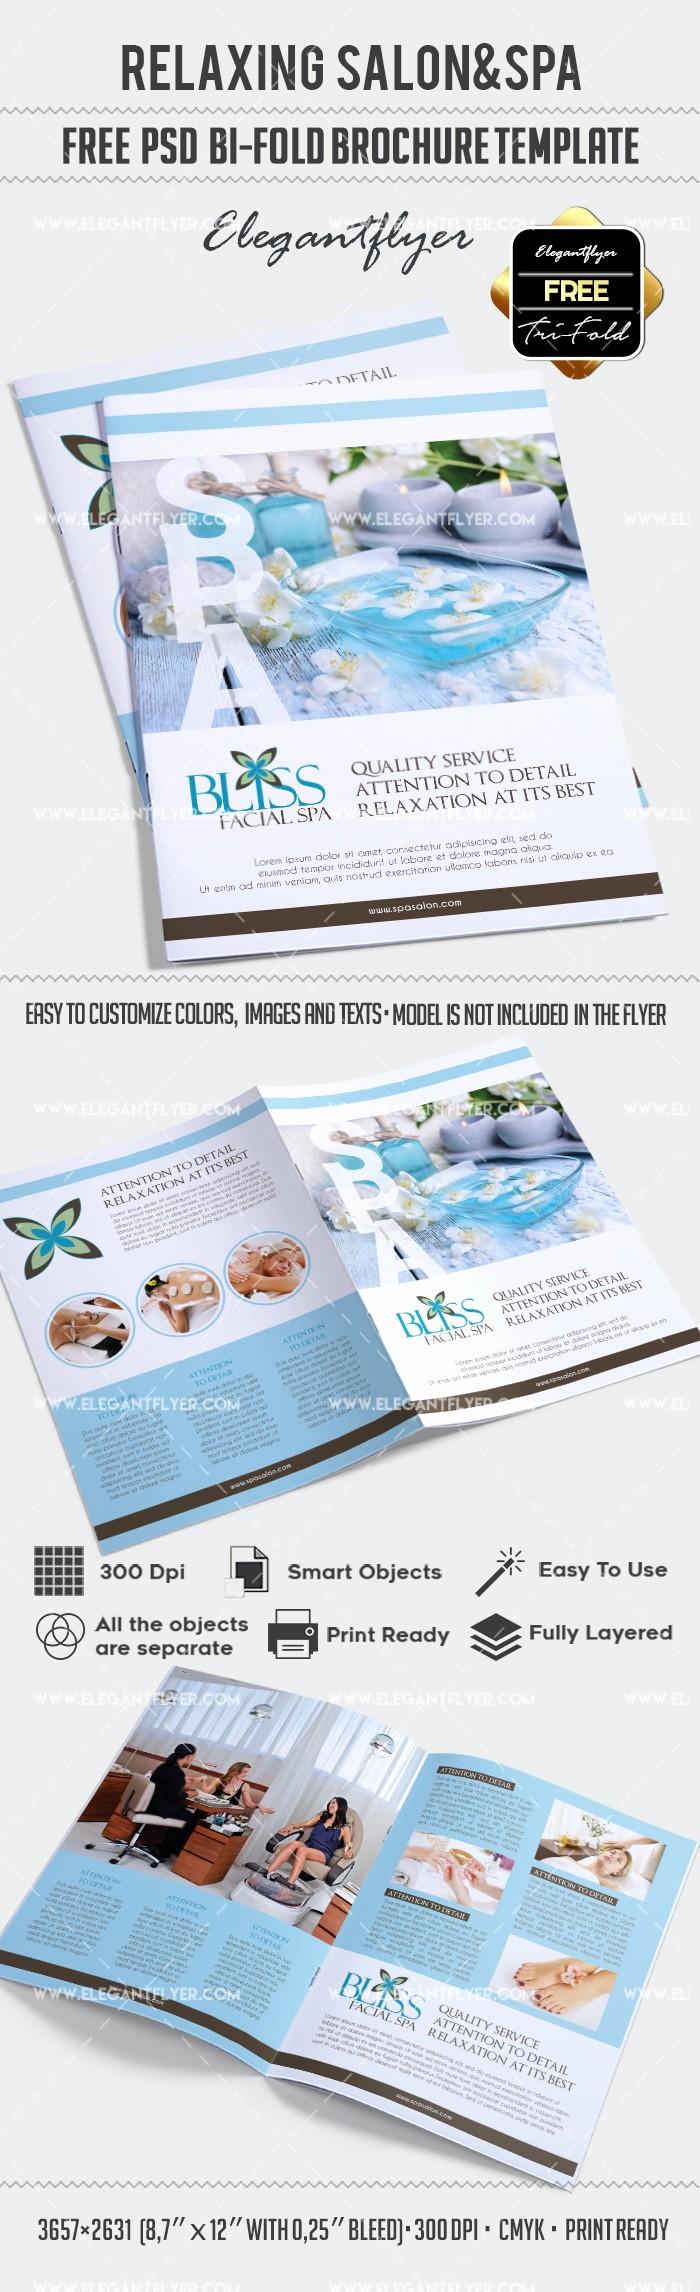 Bi Fold Brochure Templates Free New Free Relaxing Salon for Bi Fold Psd Brochure – by Elegantflyer